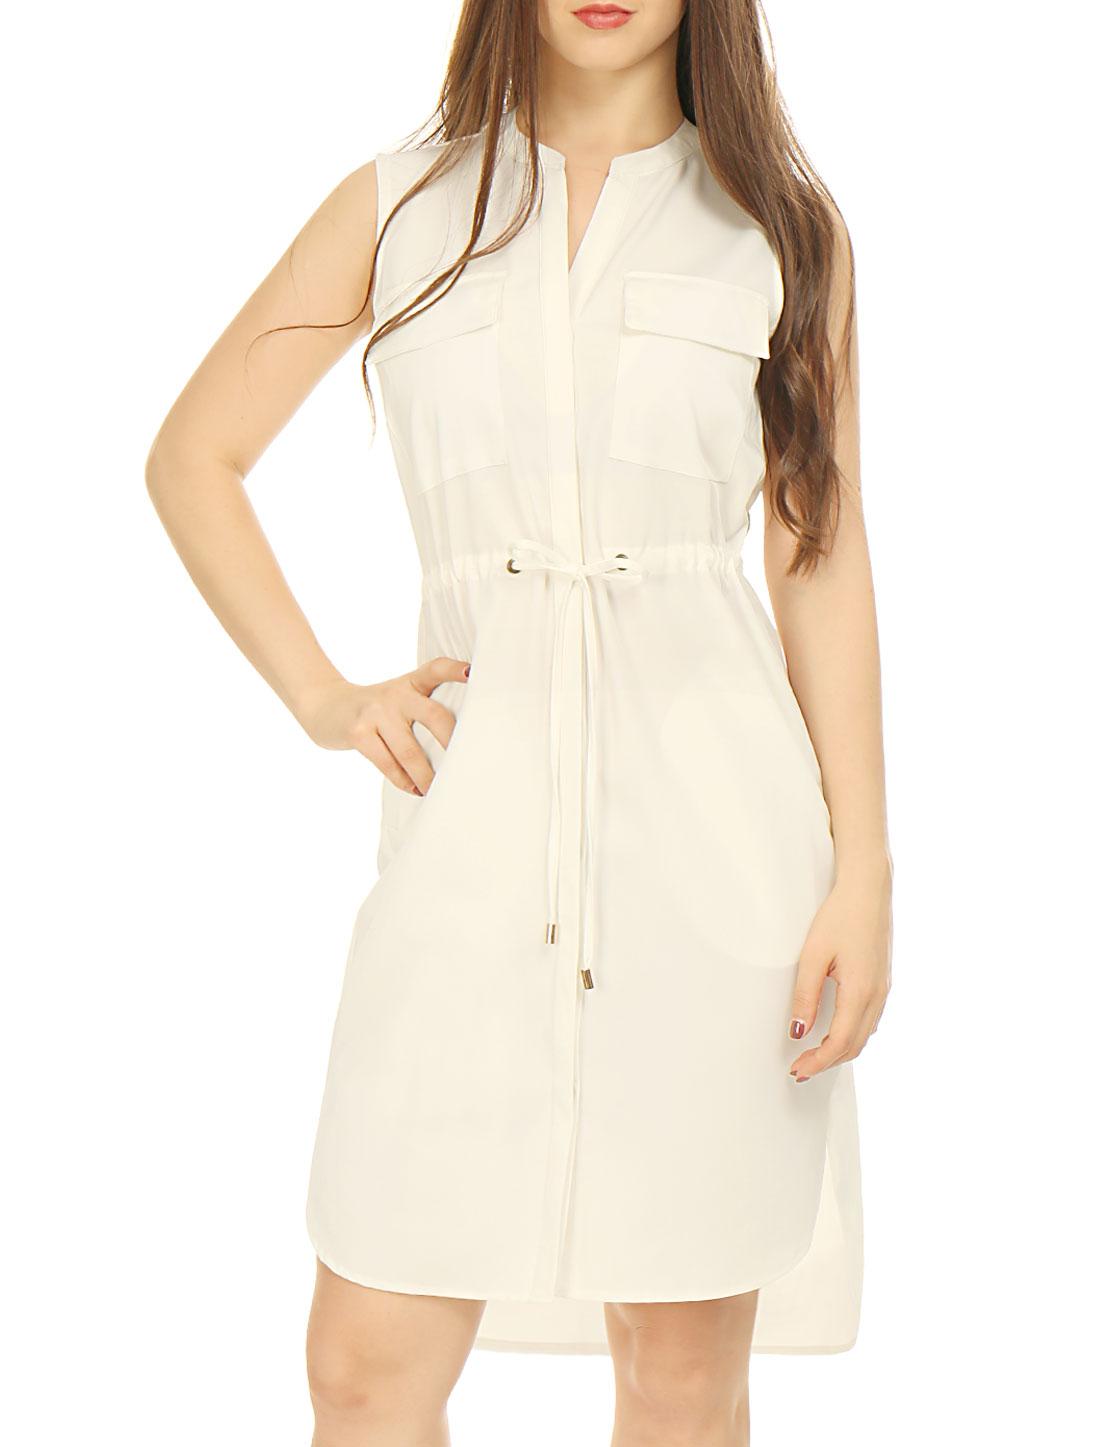 Woman Single Breasted Drawstring Sleeveless Dress Beige XL